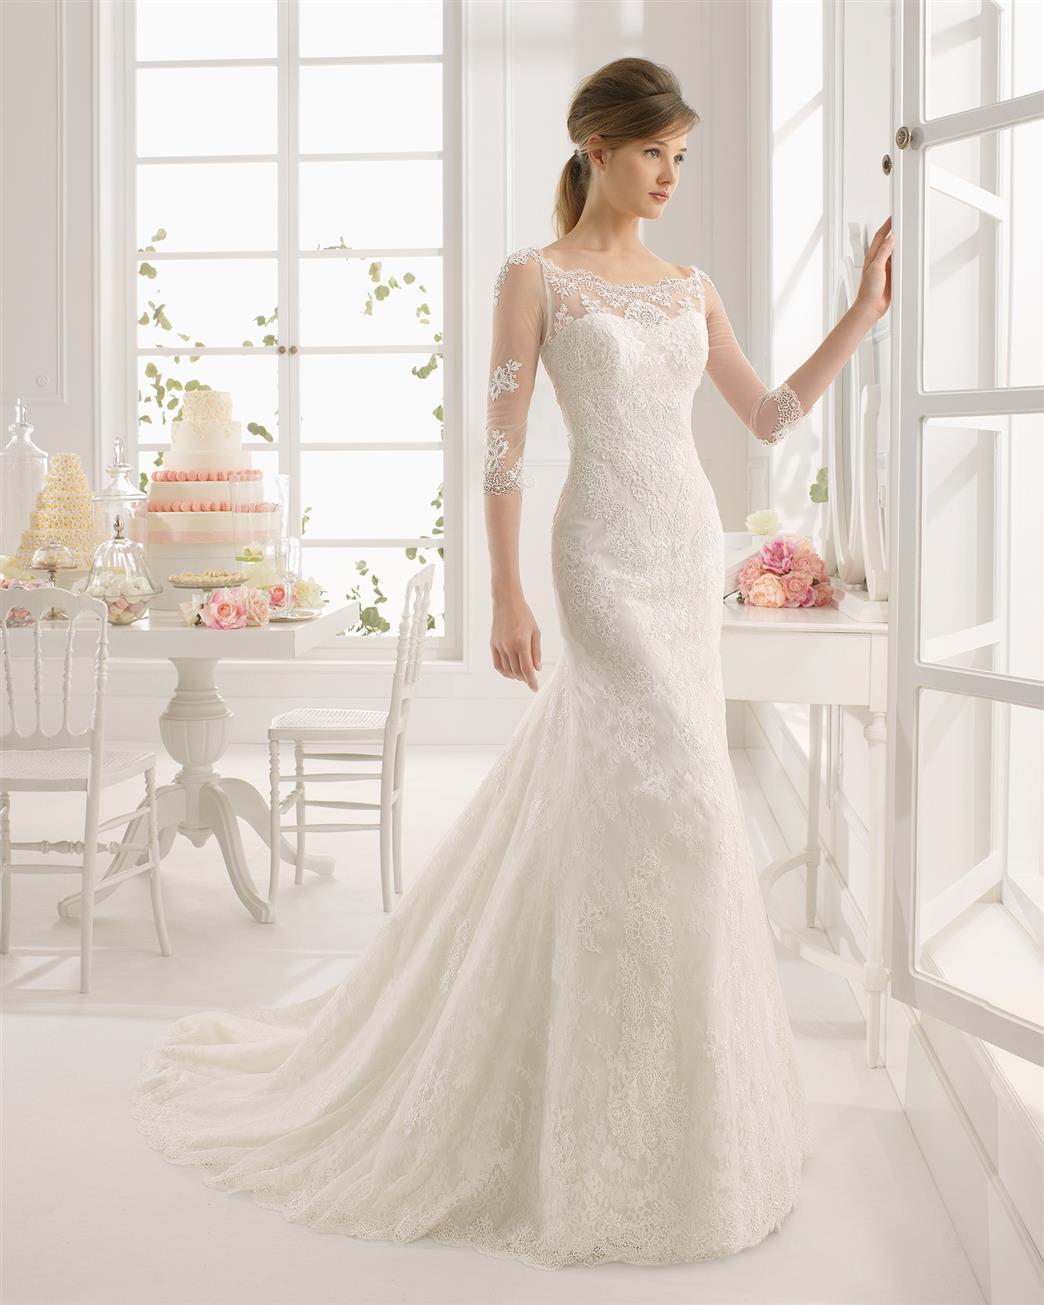 Vintage Wedding Gown Designers: 30 Exquisite & Elegant Long Sleeved Wedding Dresses : Chic